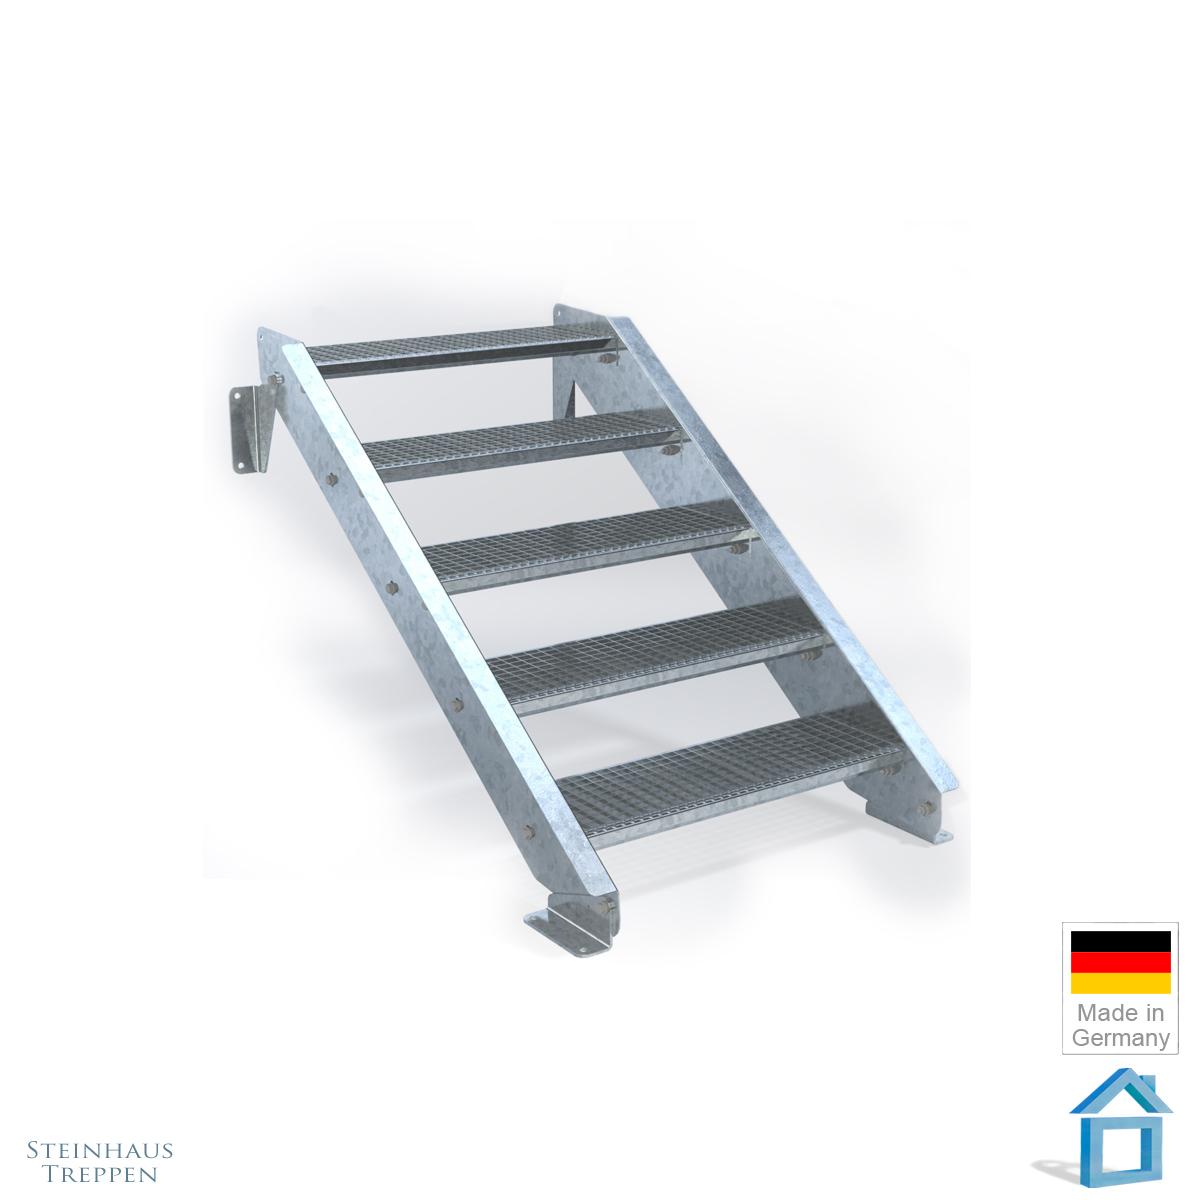 au entreppe stahl verzinkt mit stahl auflagen 80 cm breite bis h he 120 cm. Black Bedroom Furniture Sets. Home Design Ideas